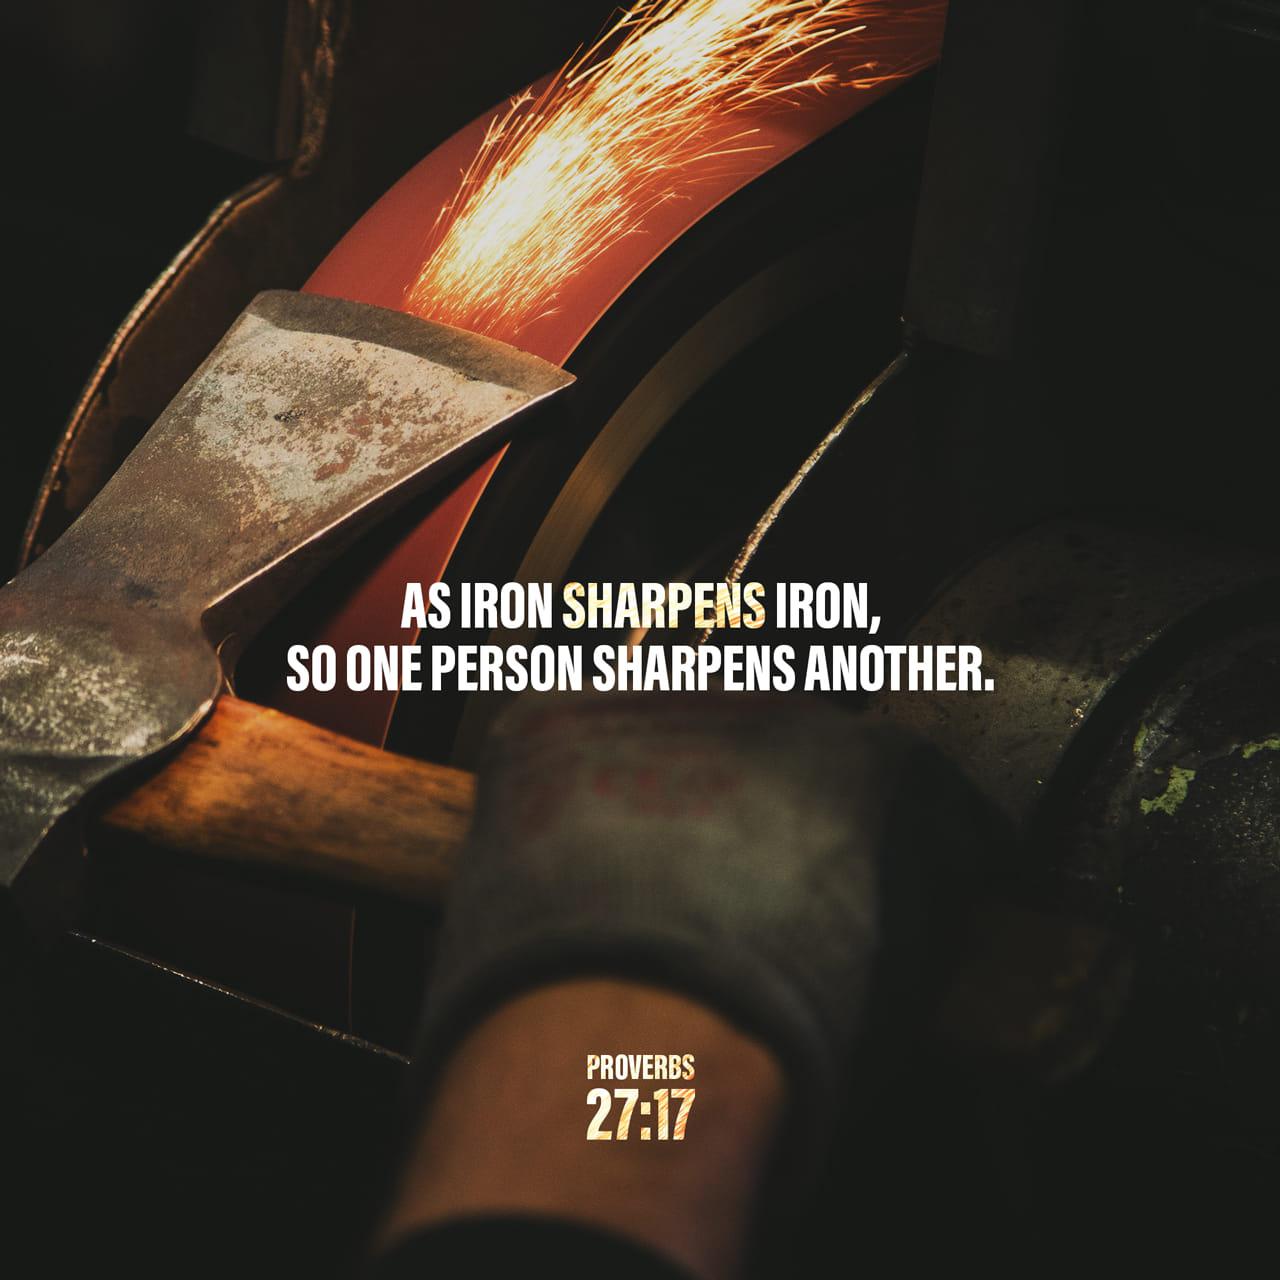 sharpen iron with iron